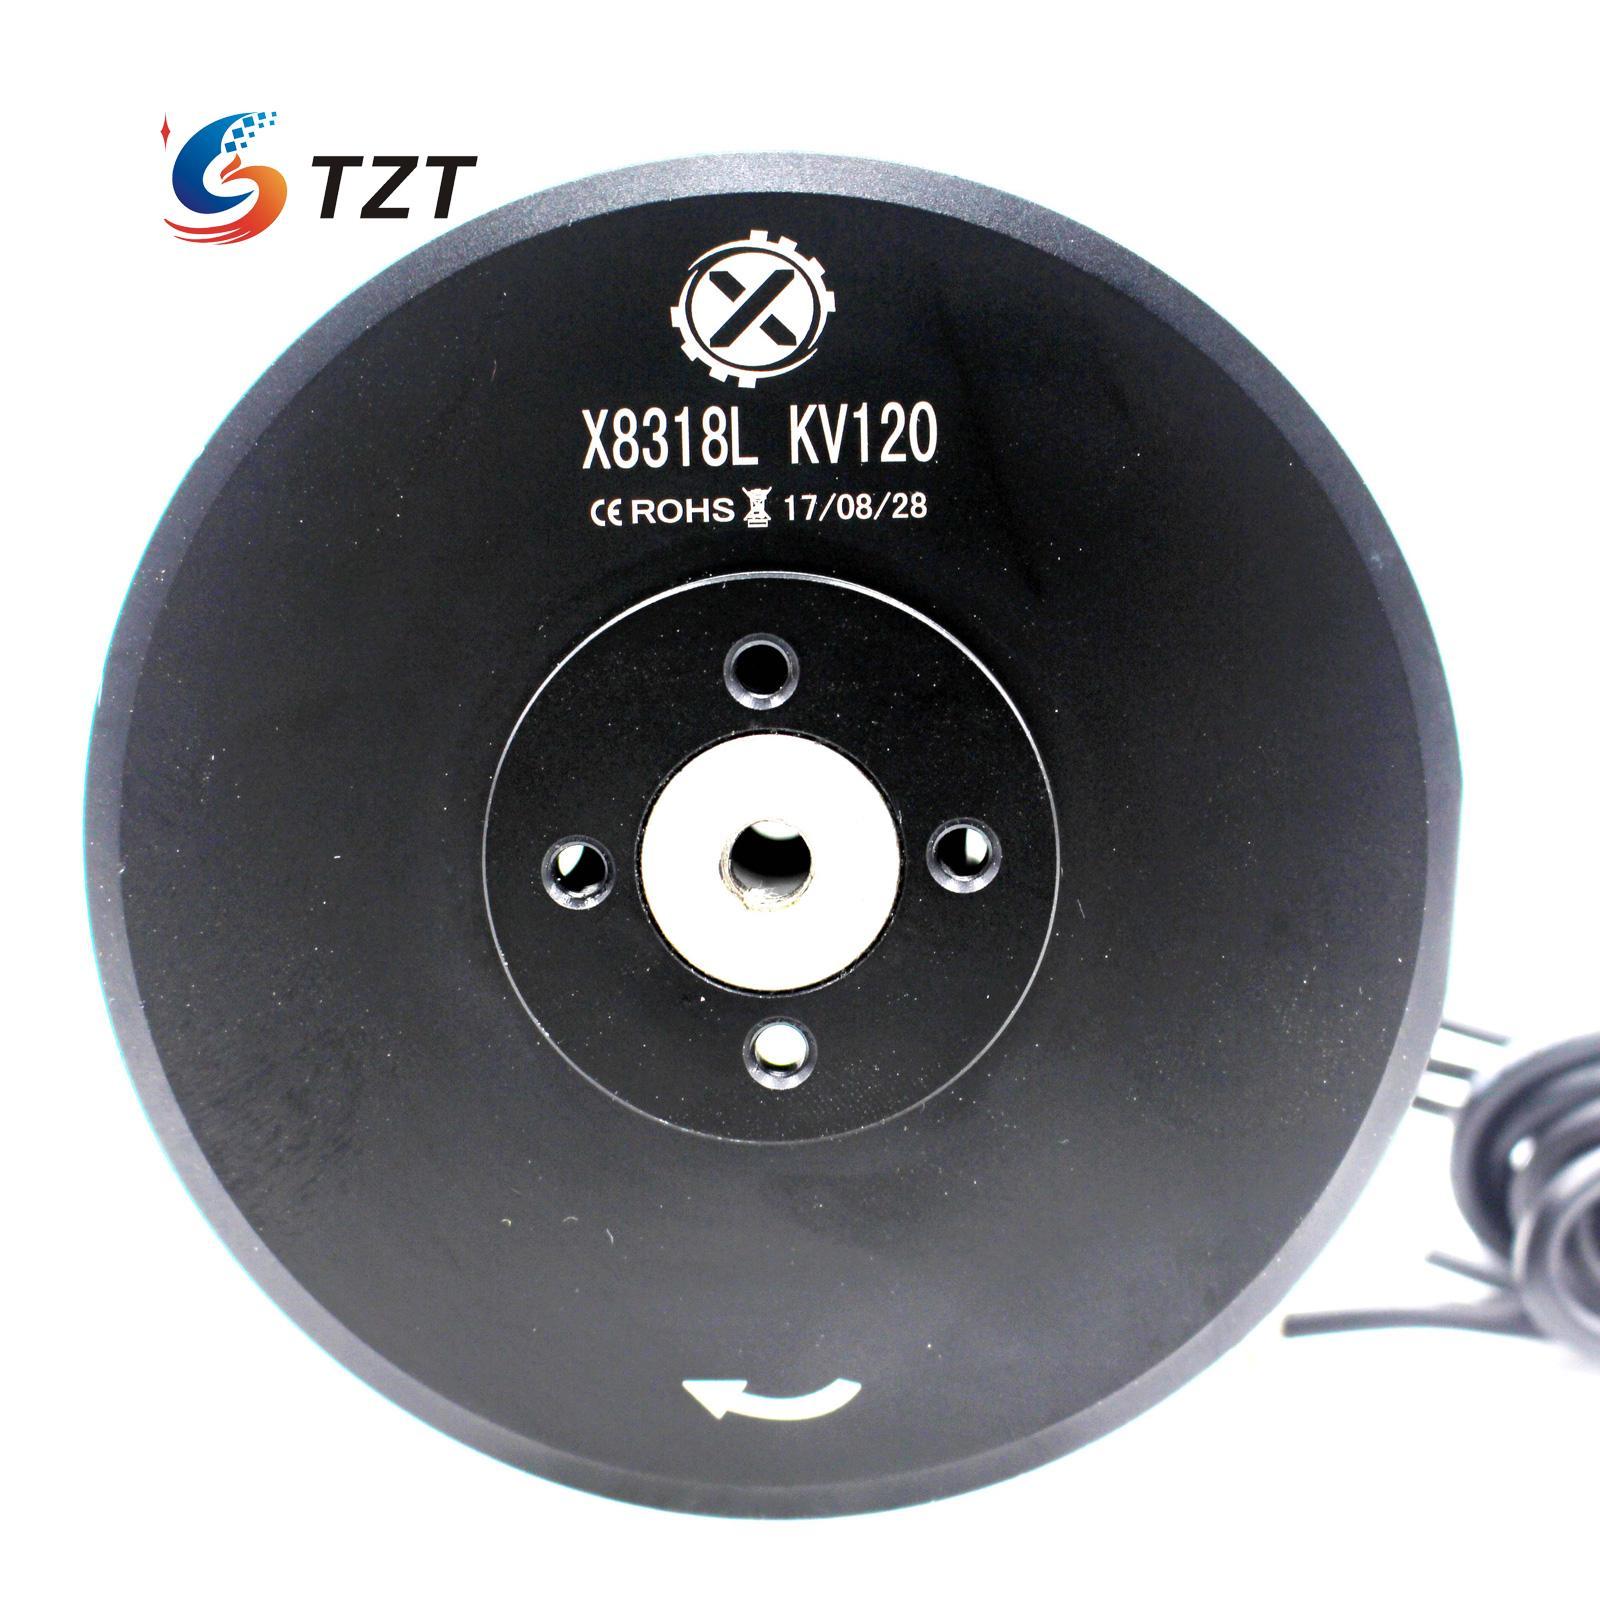 X8318L Brushless Motor KV120 Positive Reverse 36N40P for FPV Racing font b Drone b font Multicopter